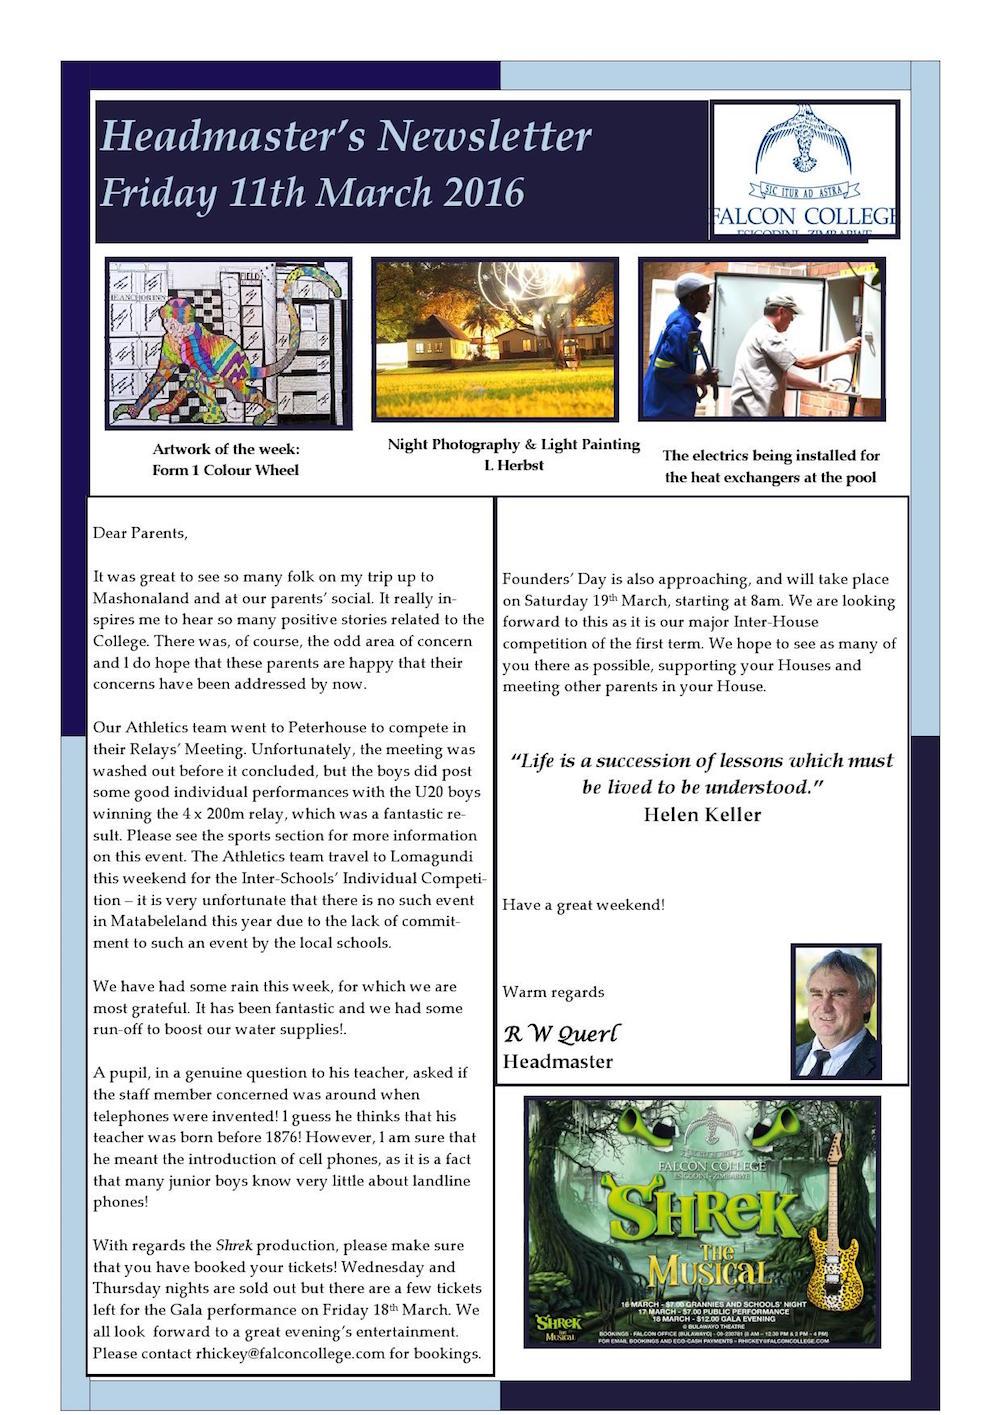 Headmaster's Newsletter Friday 11th March 2016 edited_000001